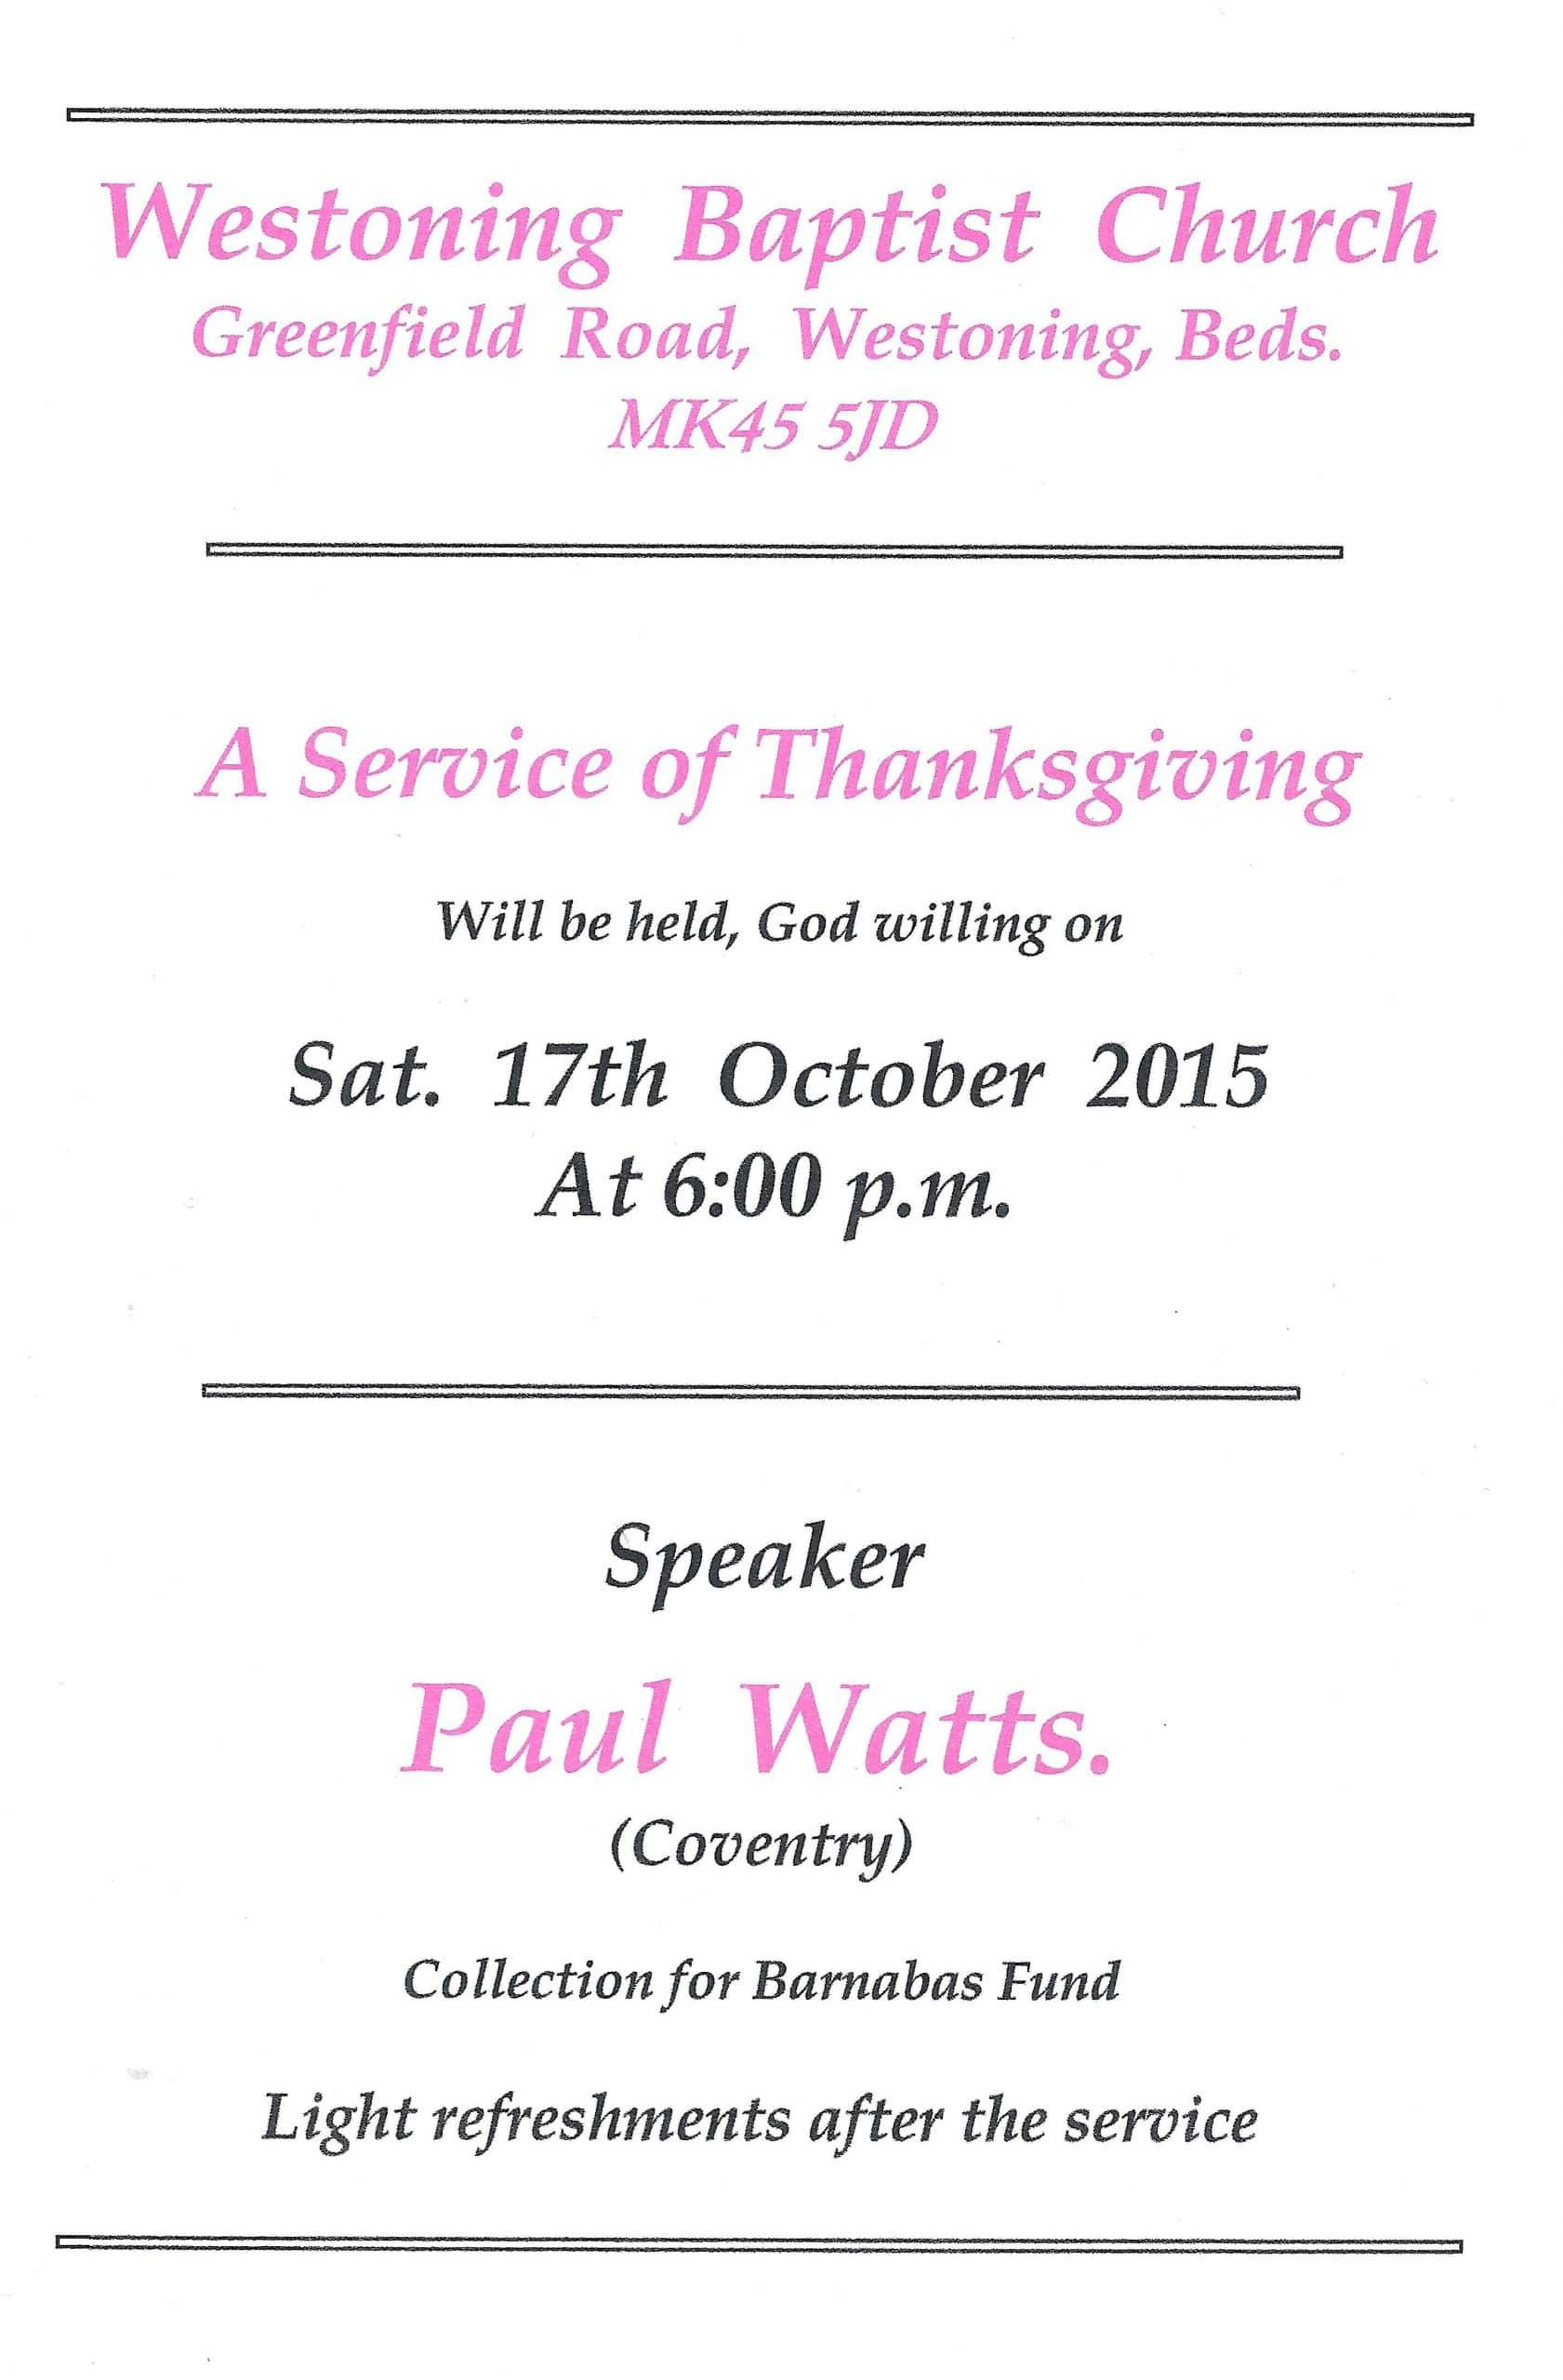 Thanksgiving service 2015